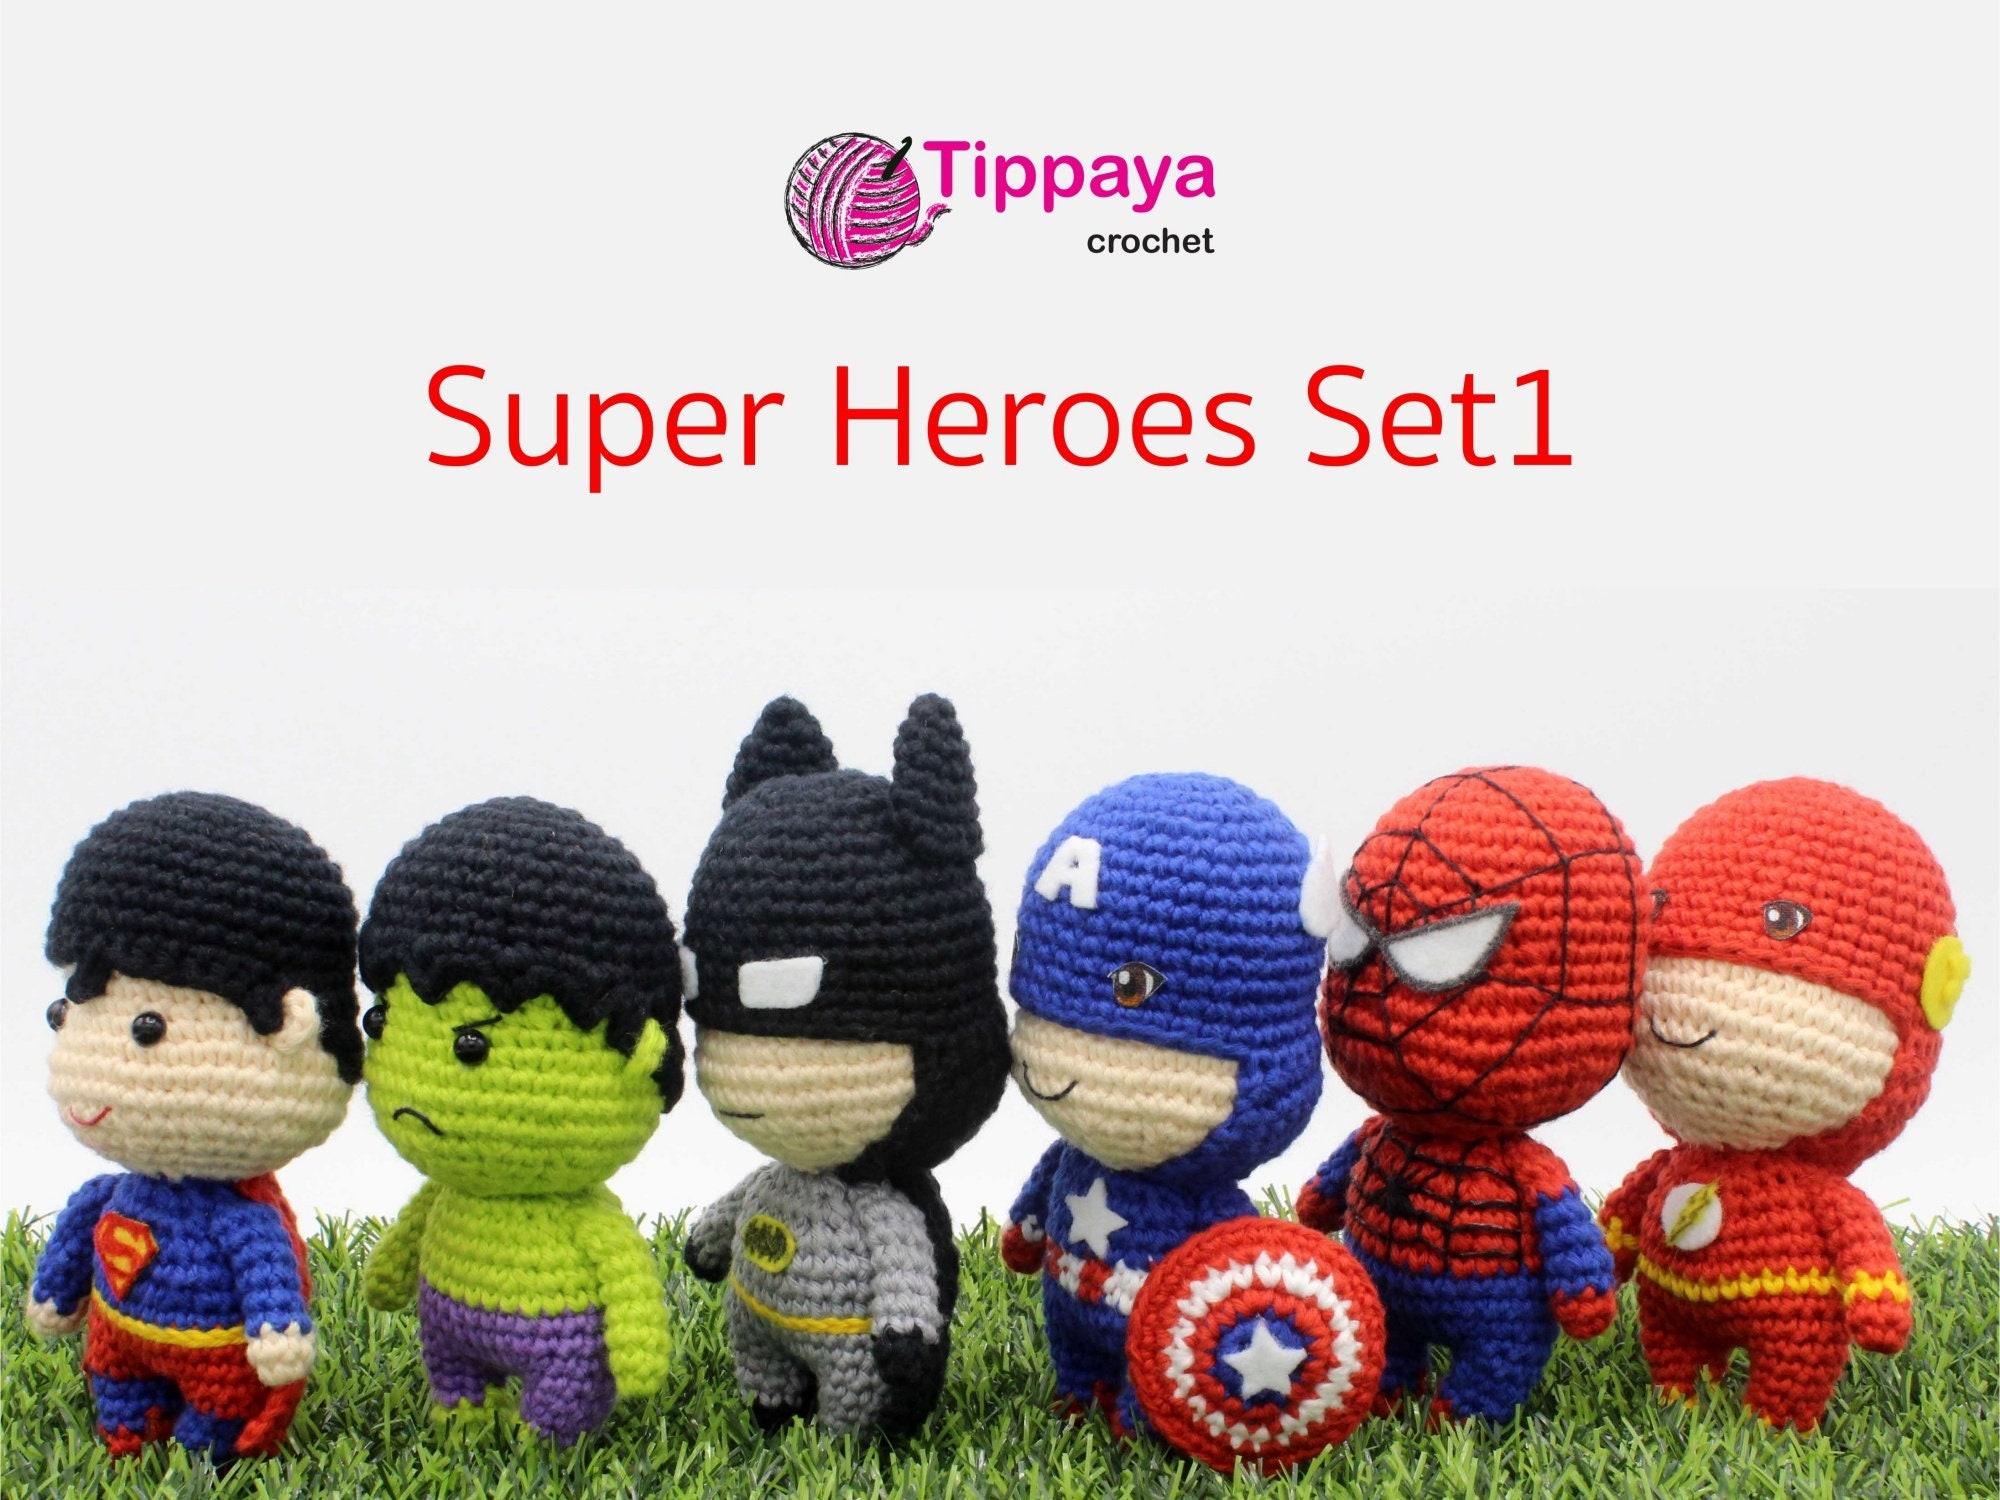 Crochet pattern of Super Heroes Set1 | Etsy